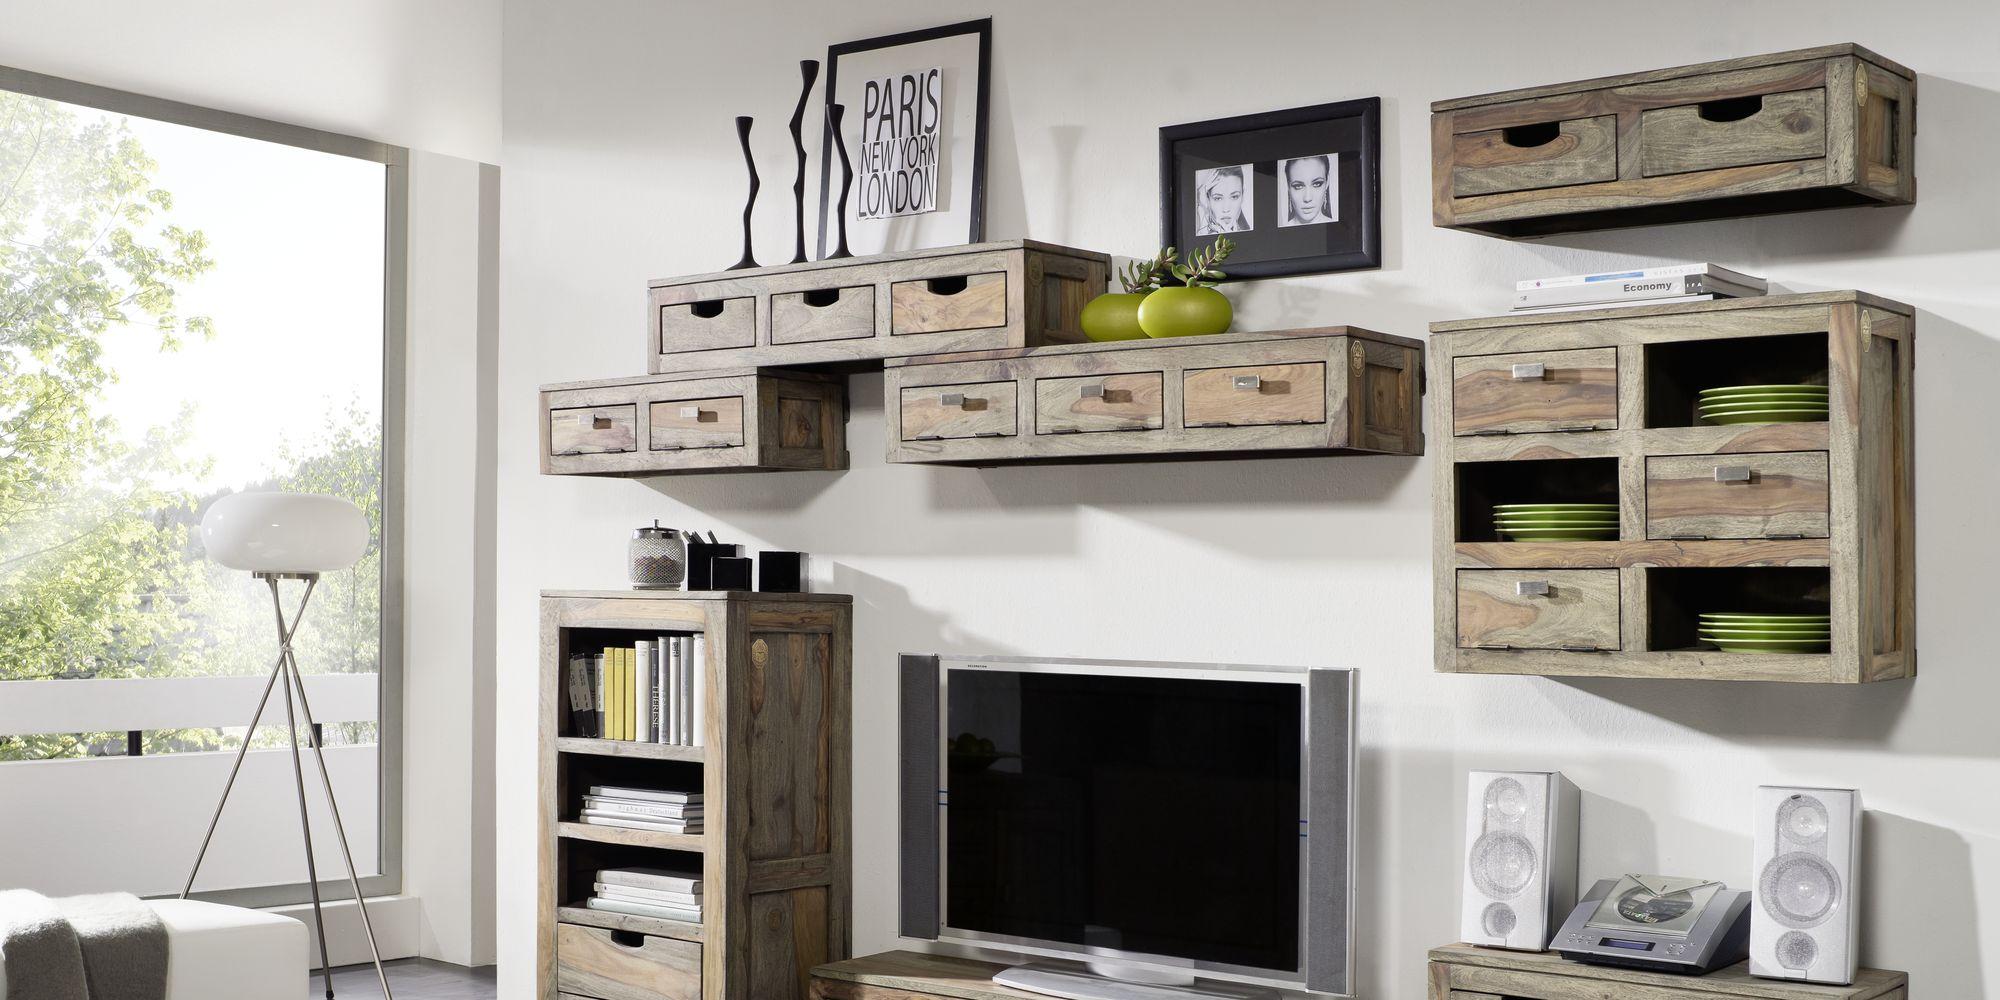 Möbelserie Klassische Sheesham Möbel Grau Geölt Nature Grey